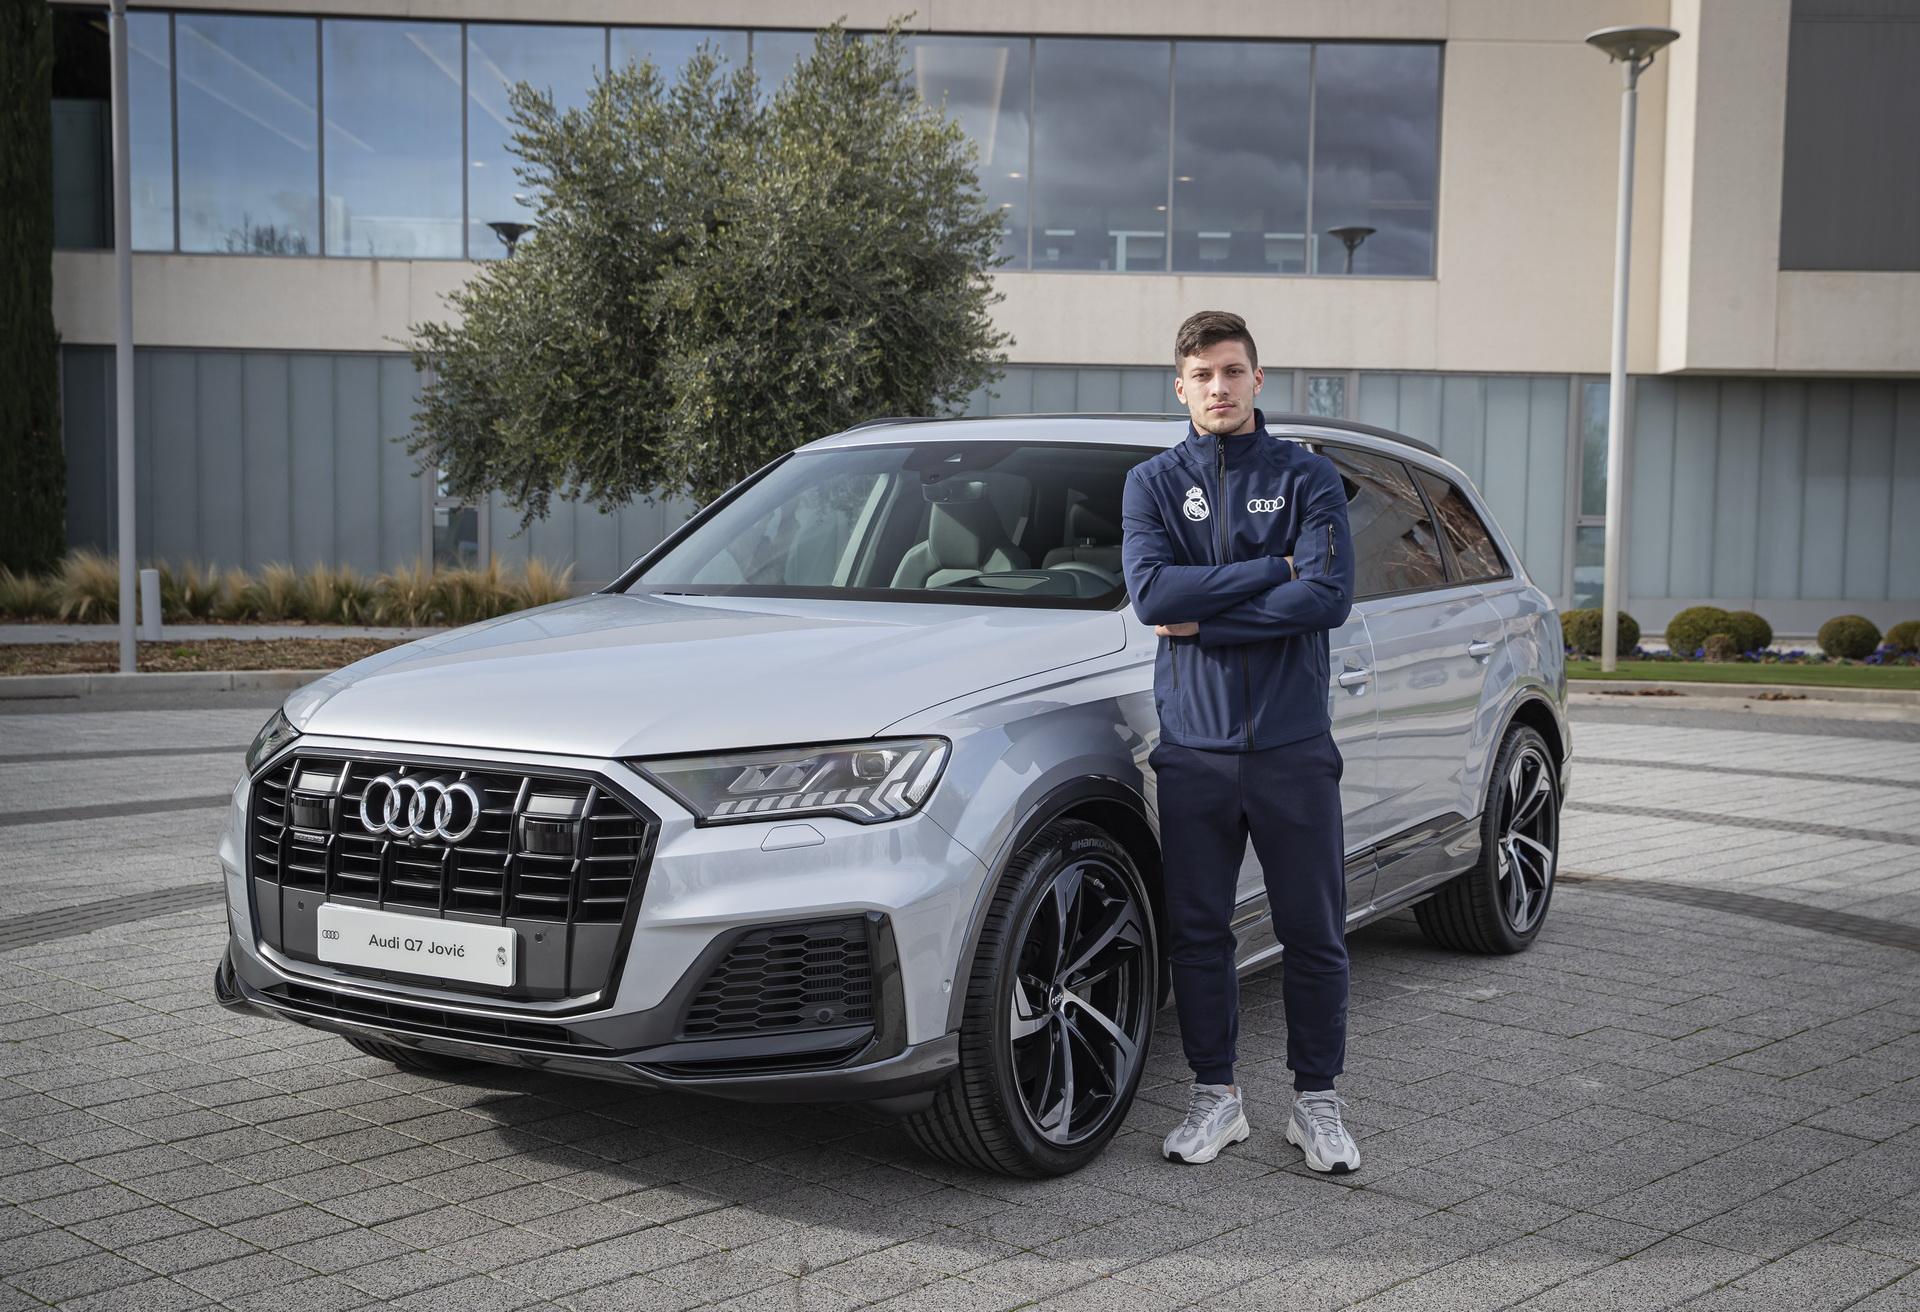 Real_Madrid_Players_Audi_0018